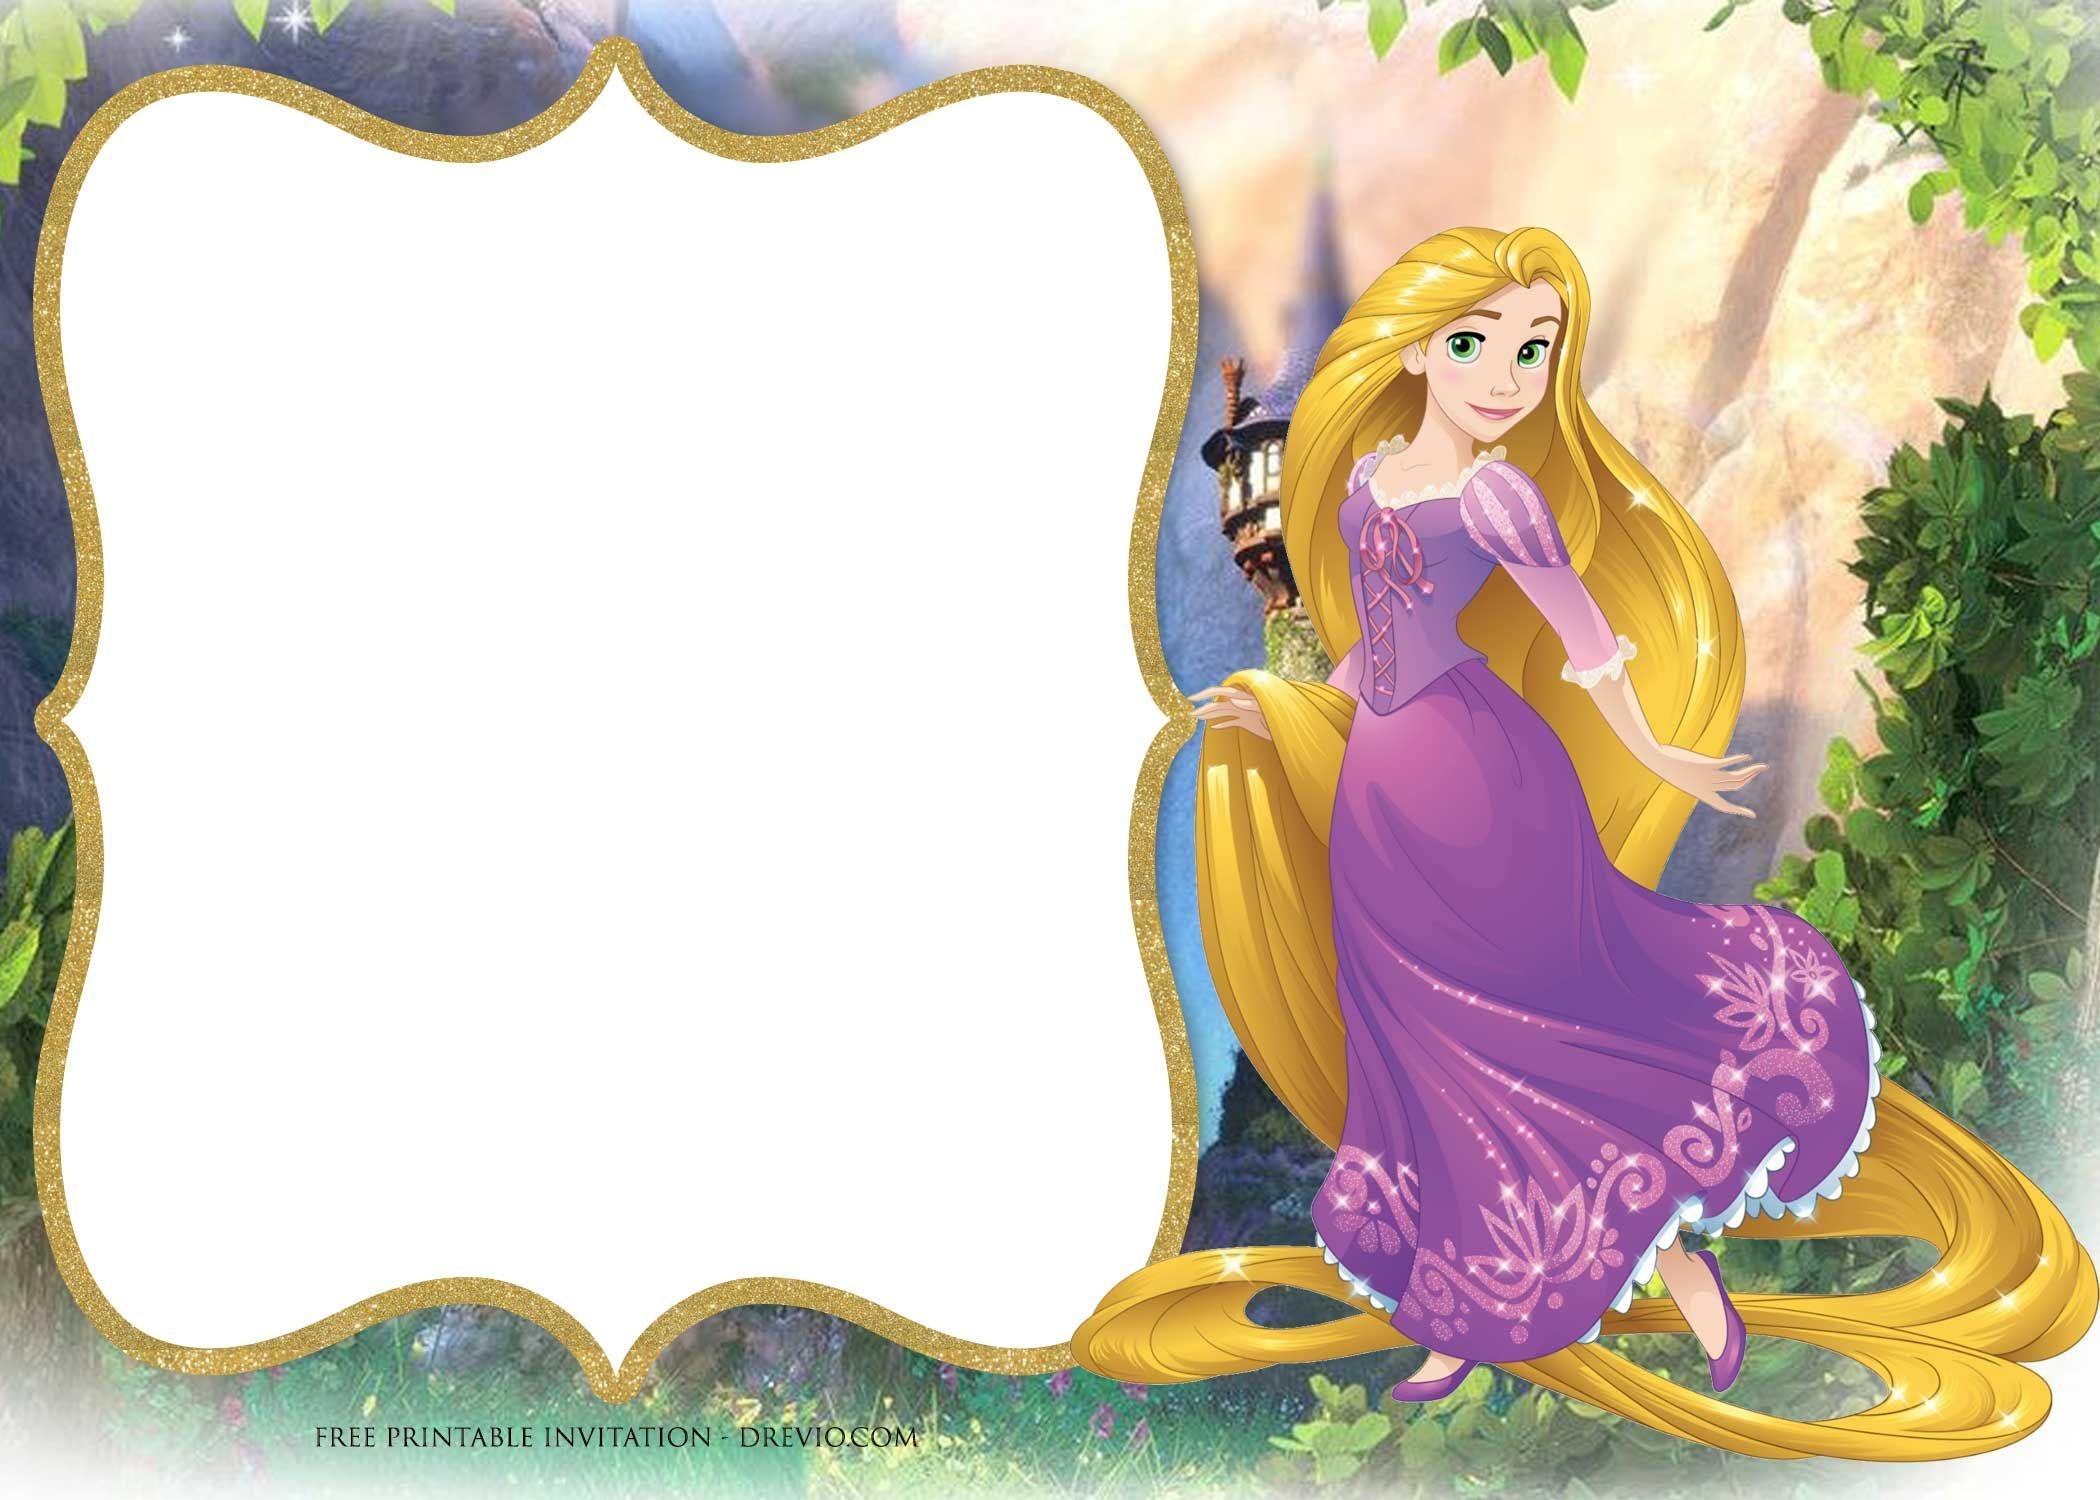 Free Printable Princess Rapunzel Invitation Templates   Free - Free Printable Tangled